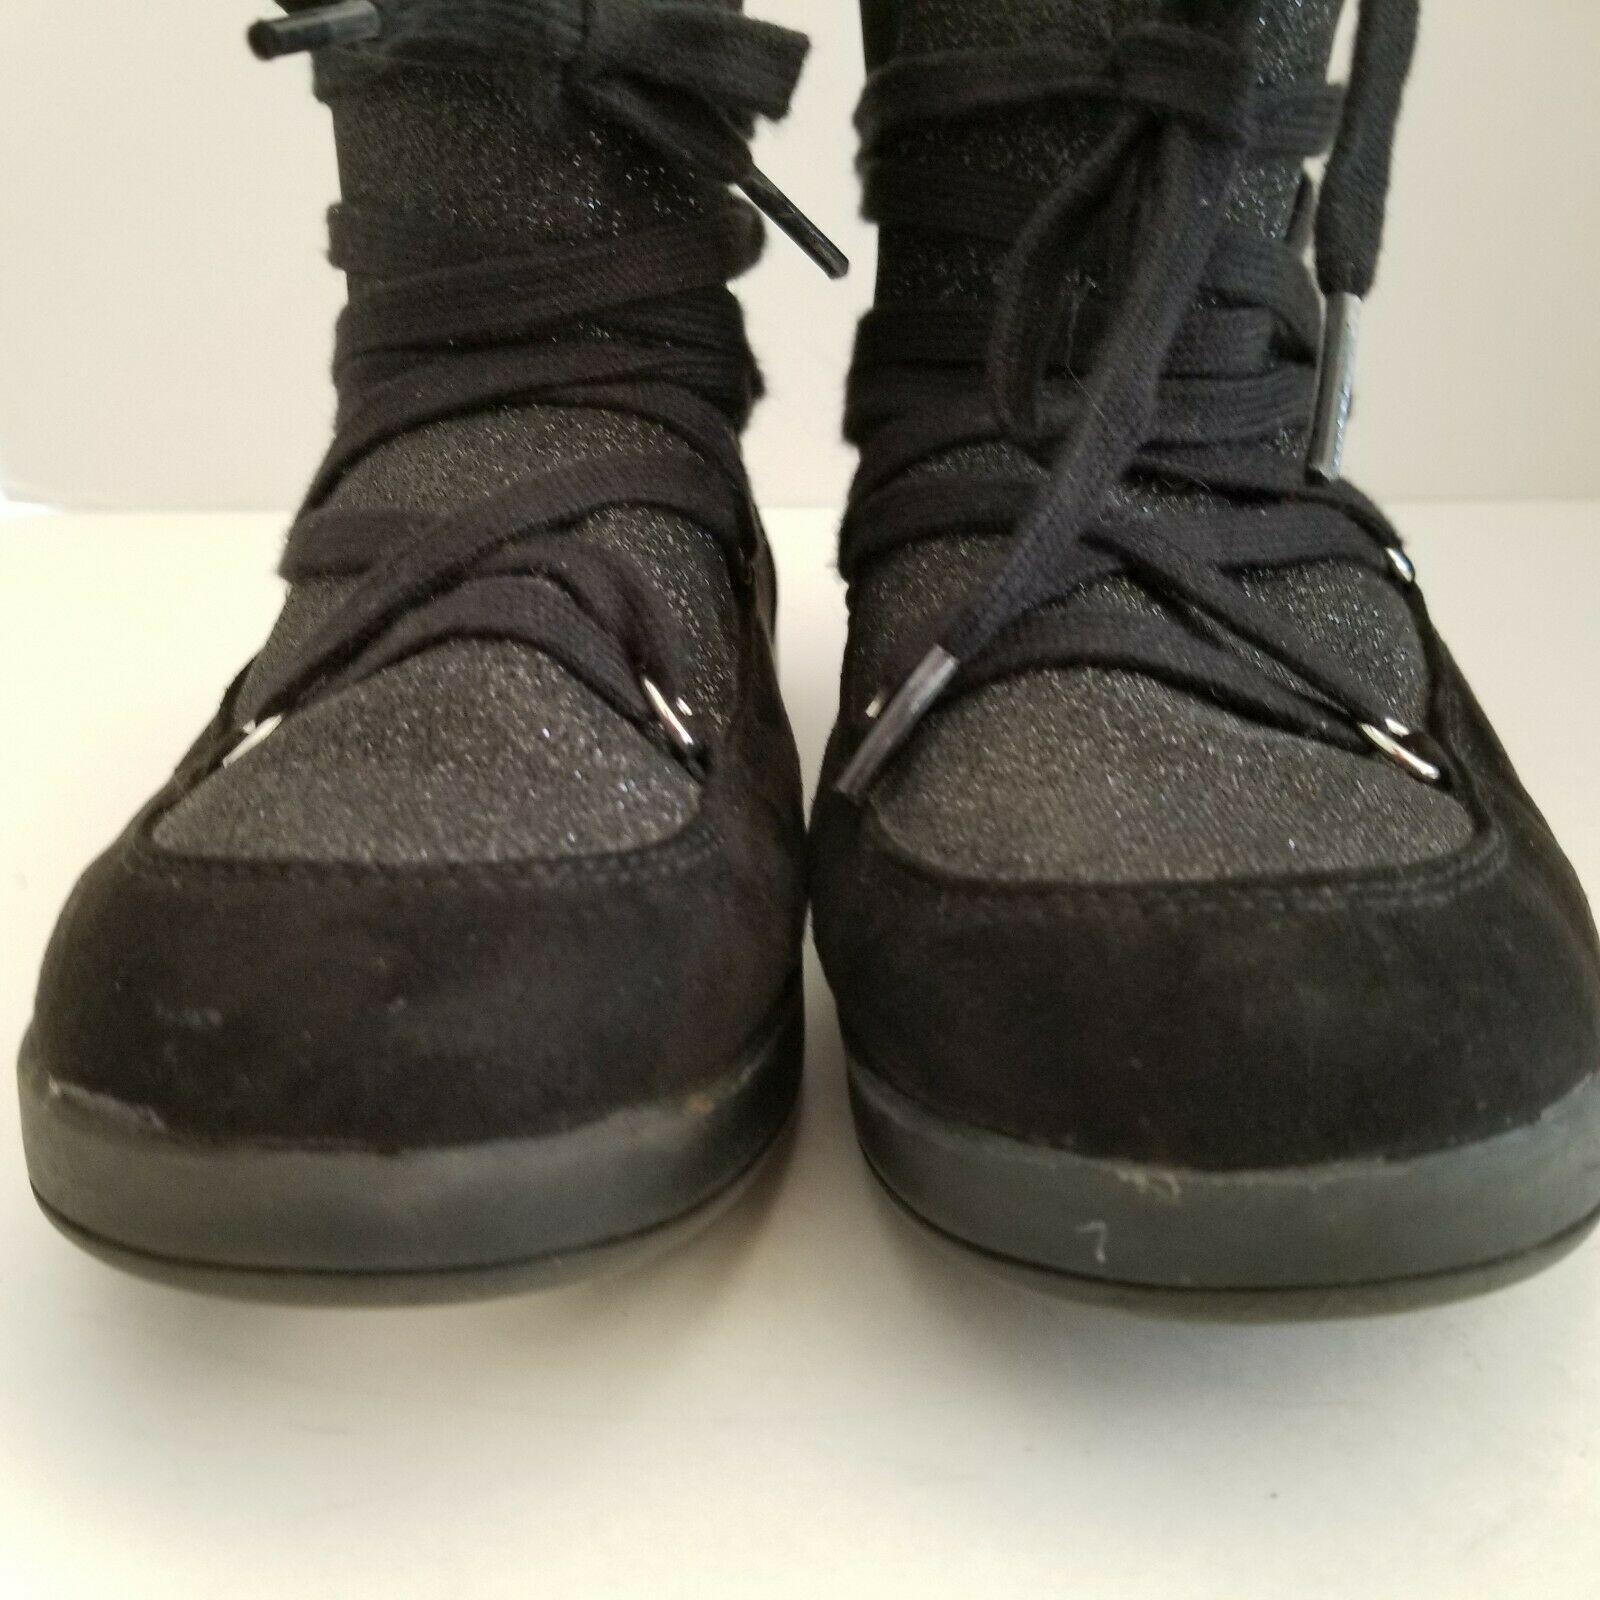 c48621685c0f Airwalk Pixie Ankle Boots GIrls 6 Black Glittery Upper Suede Trim Fur Lined